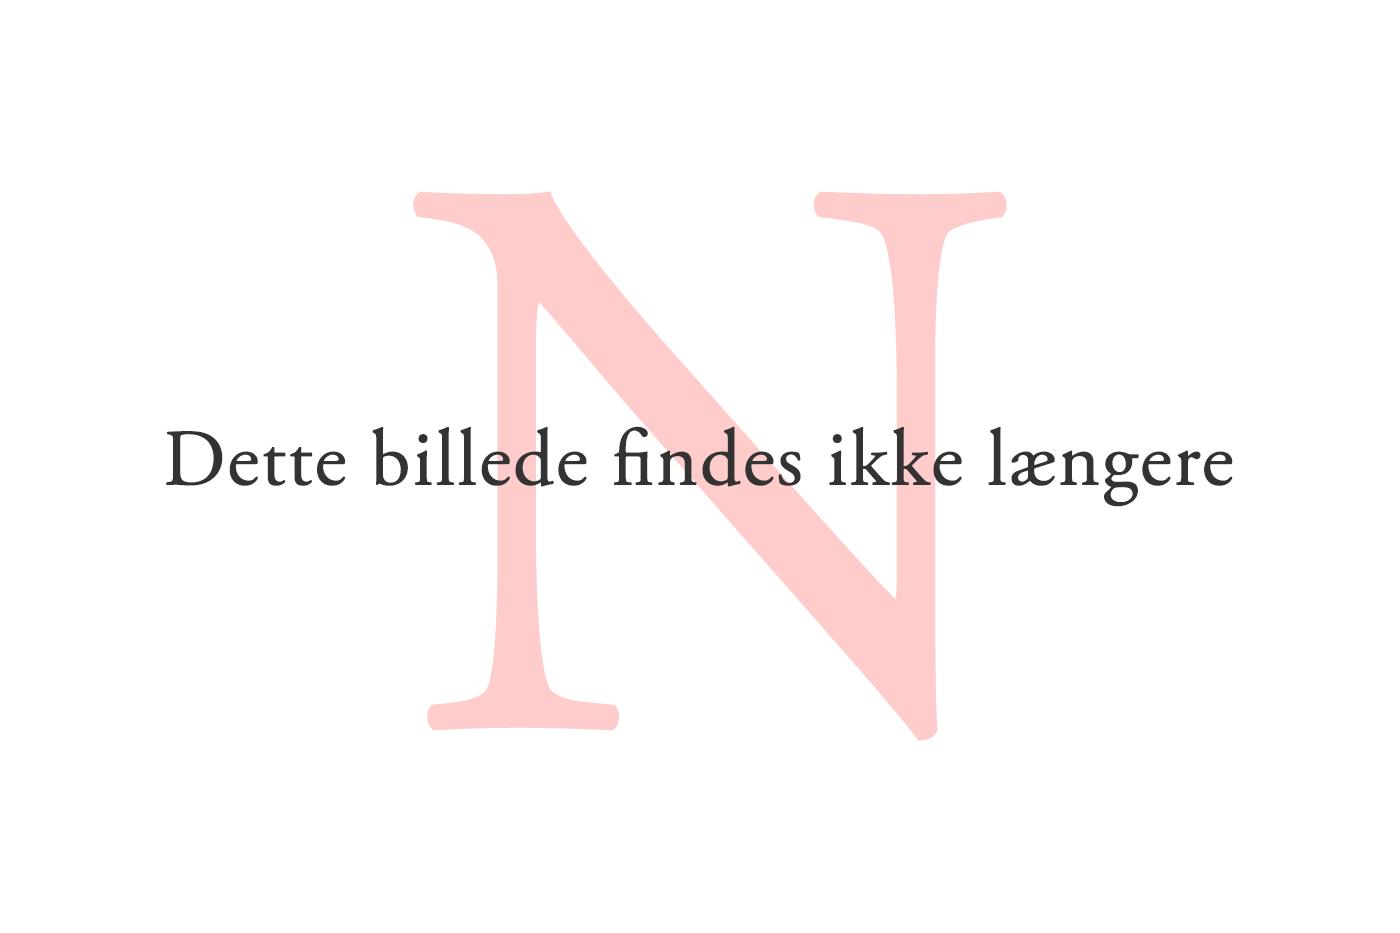 Bryster. Kilde: Pixabay